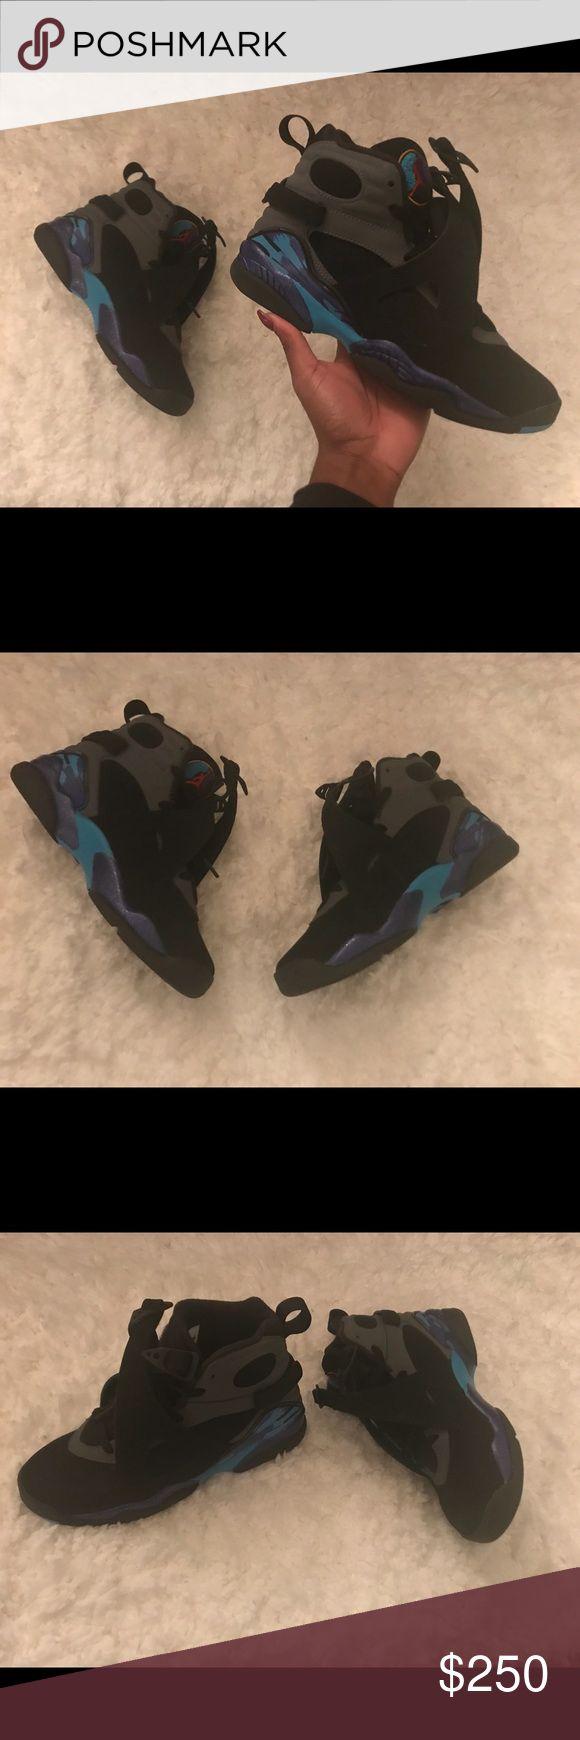 Air Jordan Aqua 8 Size 5.5Y Worn only a few times No box Air Jordan Shoes Athletic Shoes